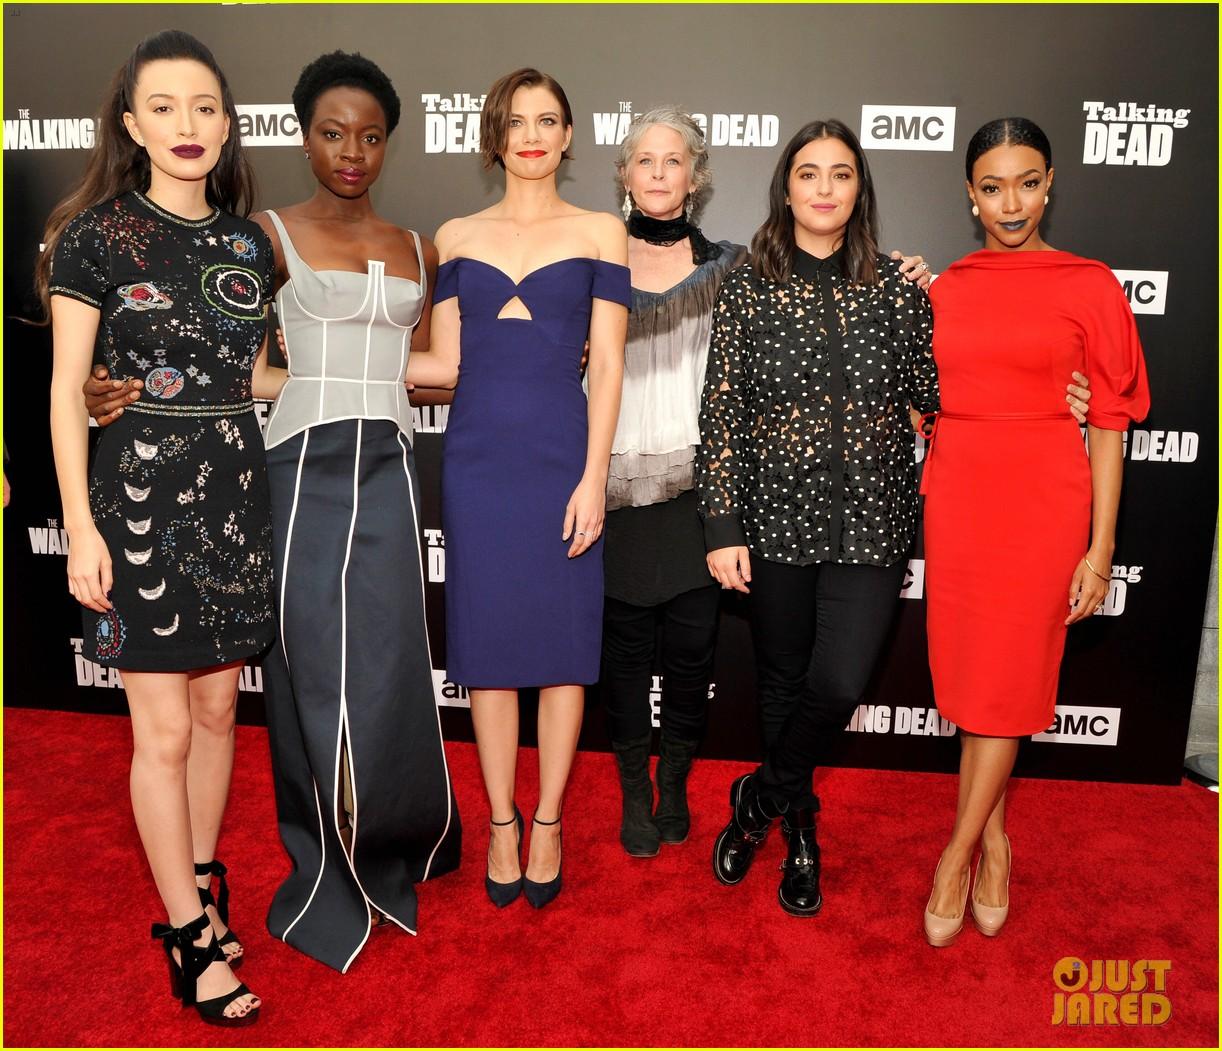 the walking dead cast gathers to talk about season 7 033791996